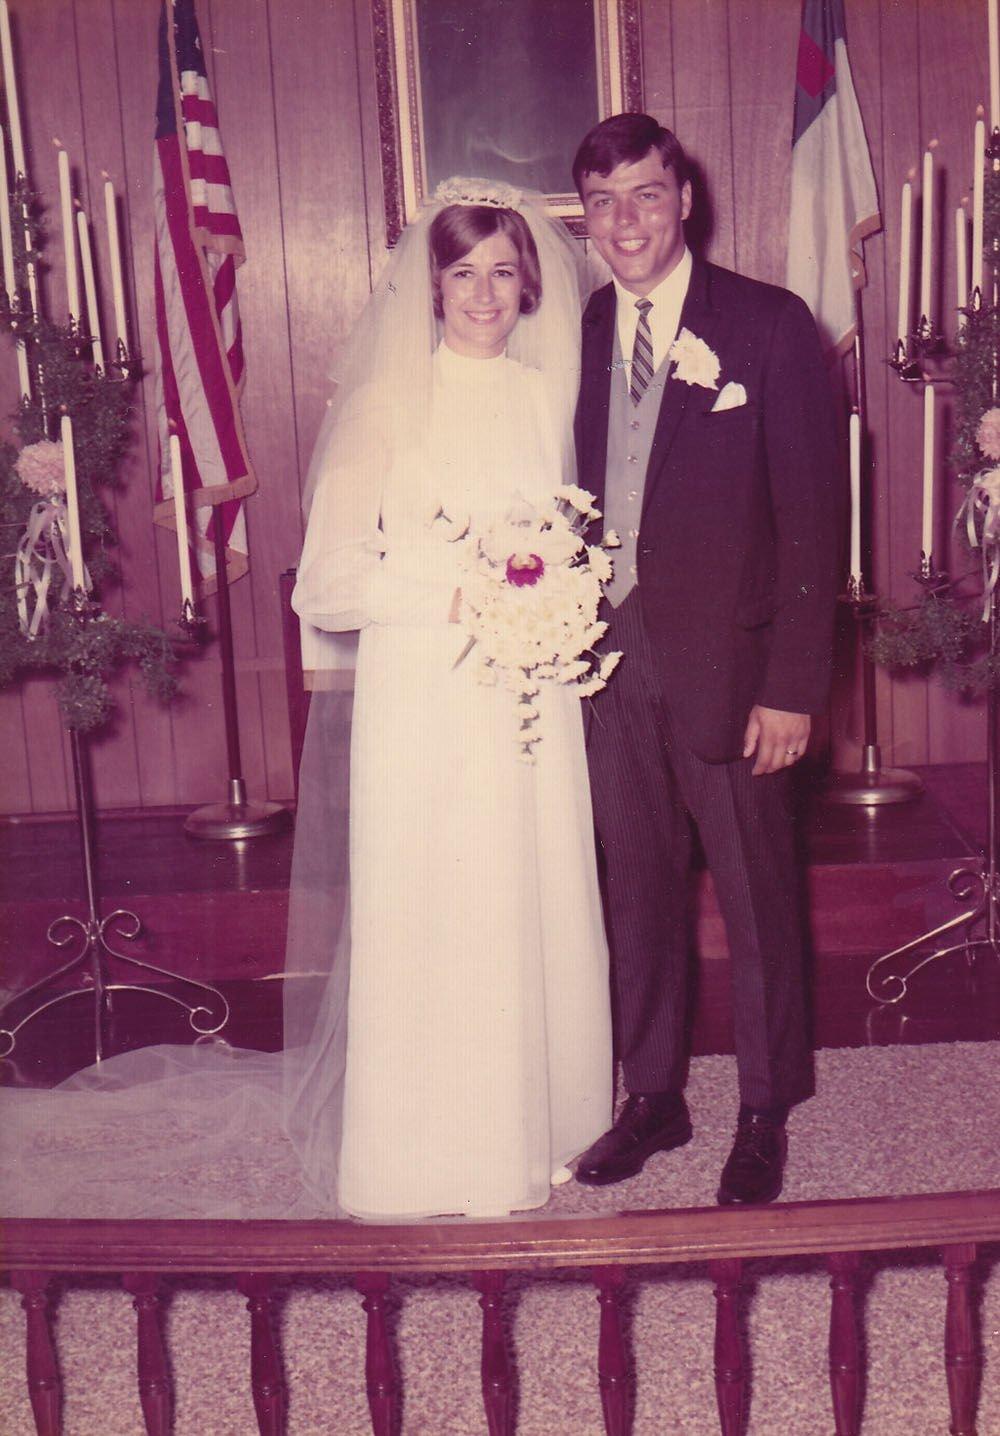 Virginia and Jim Vanek on their wedding day.